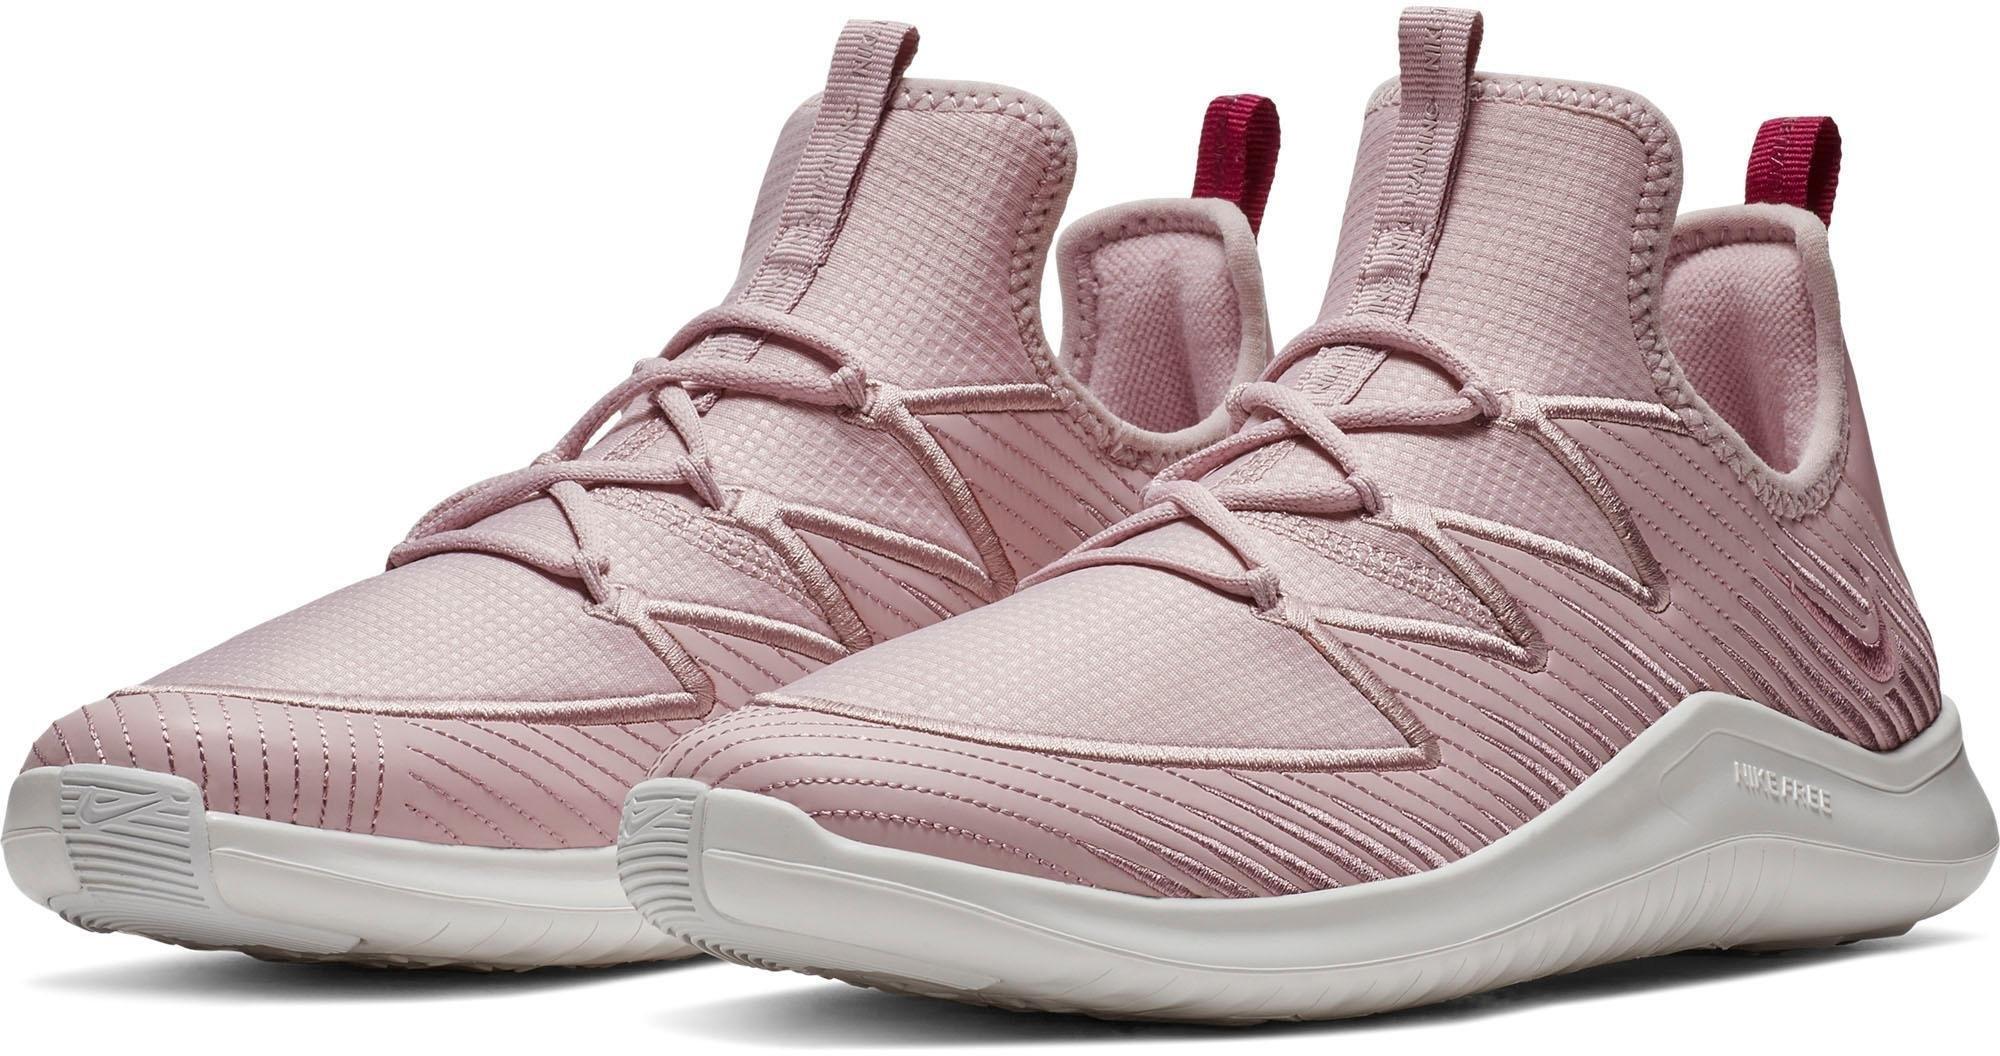 Nike fitnessschoenen »Wmns Free Tr 9« goedkoop op otto.nl kopen